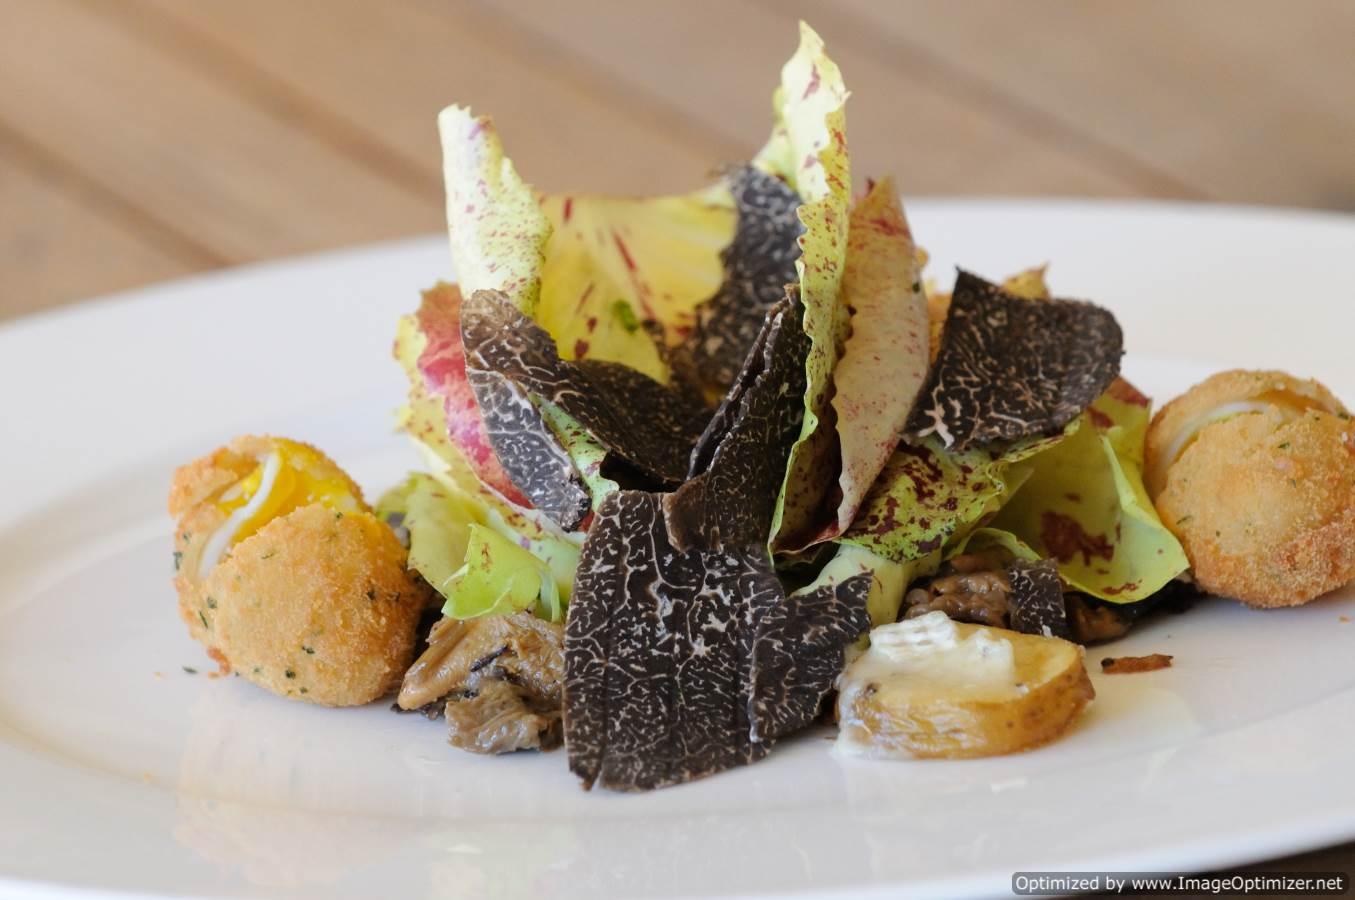 Frisée Salad of Black Truffles - MSL Truffles